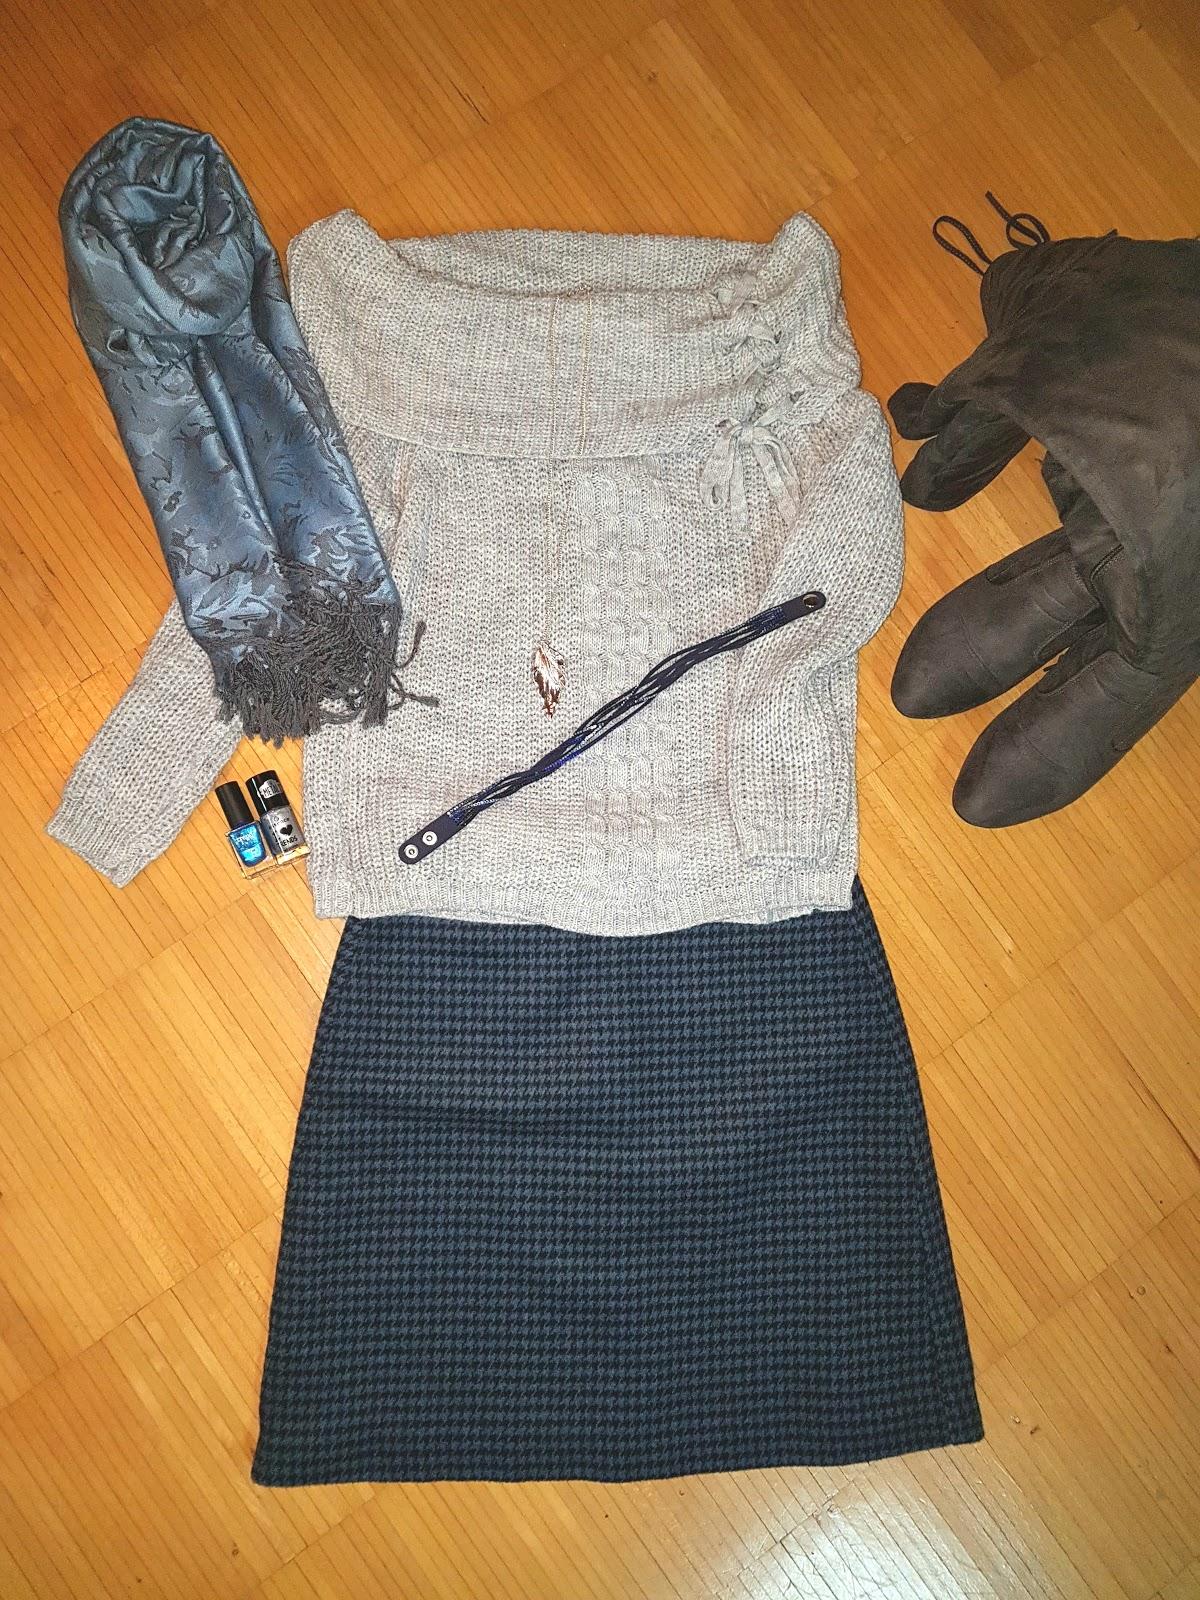 Top-Age Bitch: Pullover im trendigen Grobstrick - Look